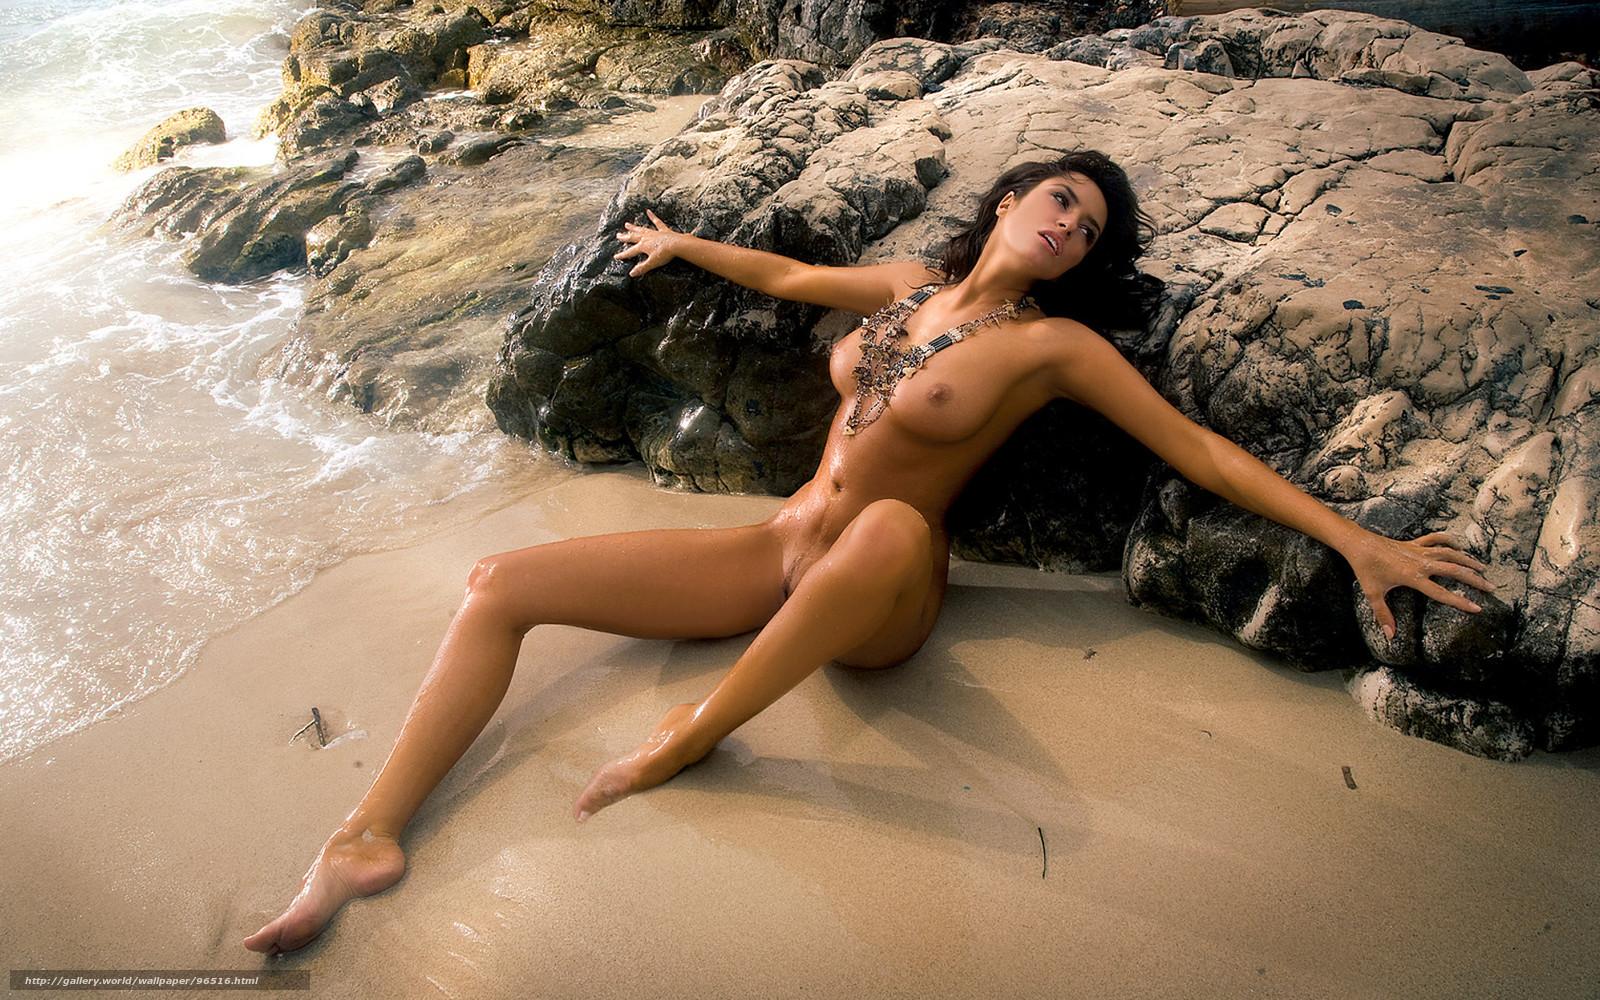 Руски голи фото женшина 22 фотография